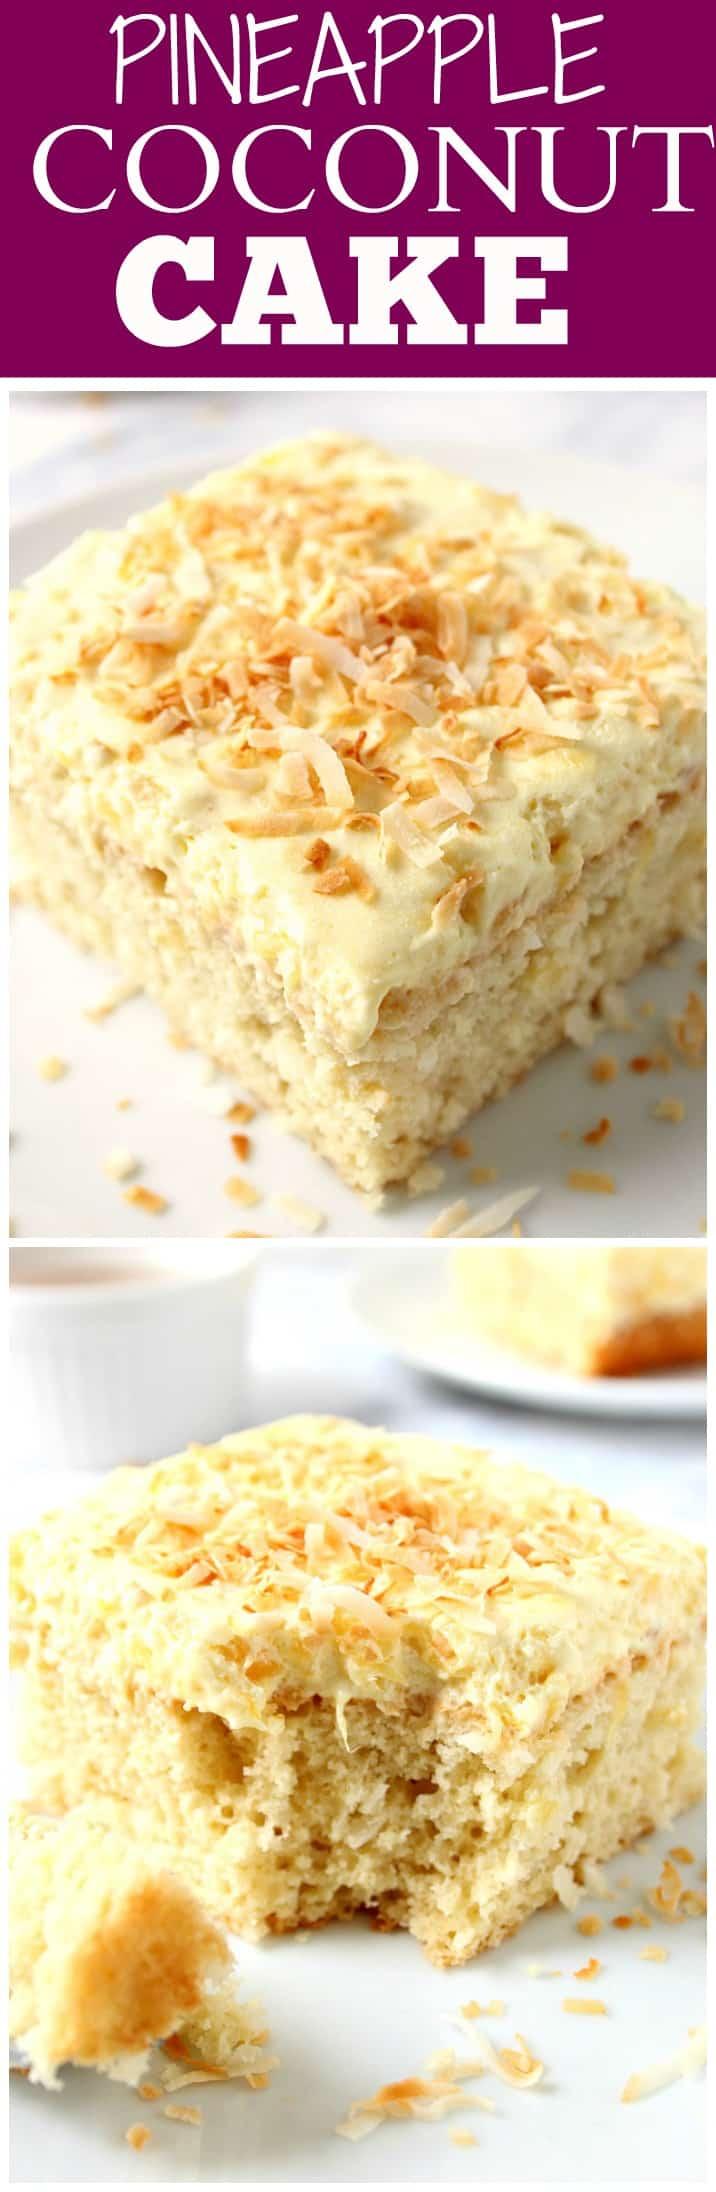 coconut pineapple cake recipe long Coconut Pineapple Cake Recipe